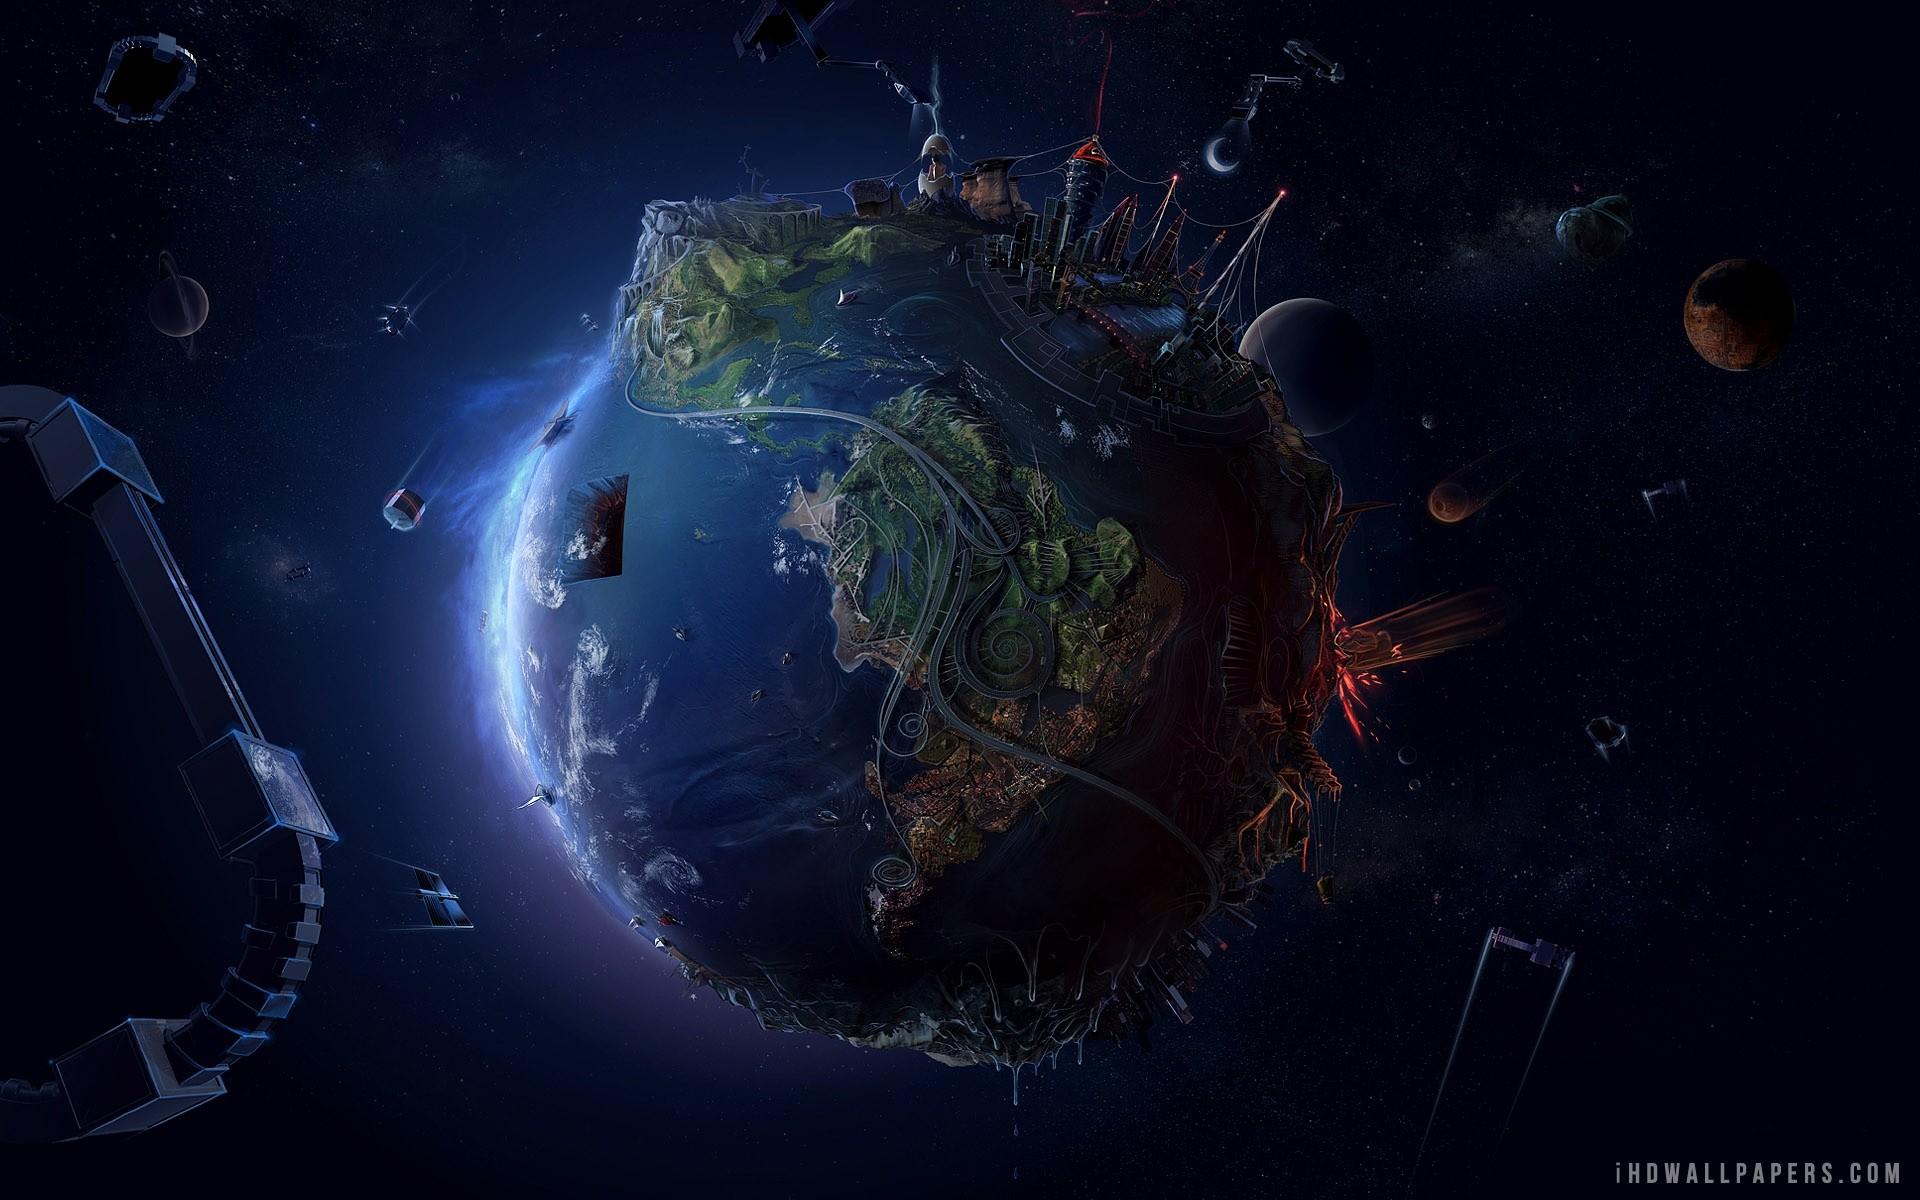 Alien Planet wallpaper thumb